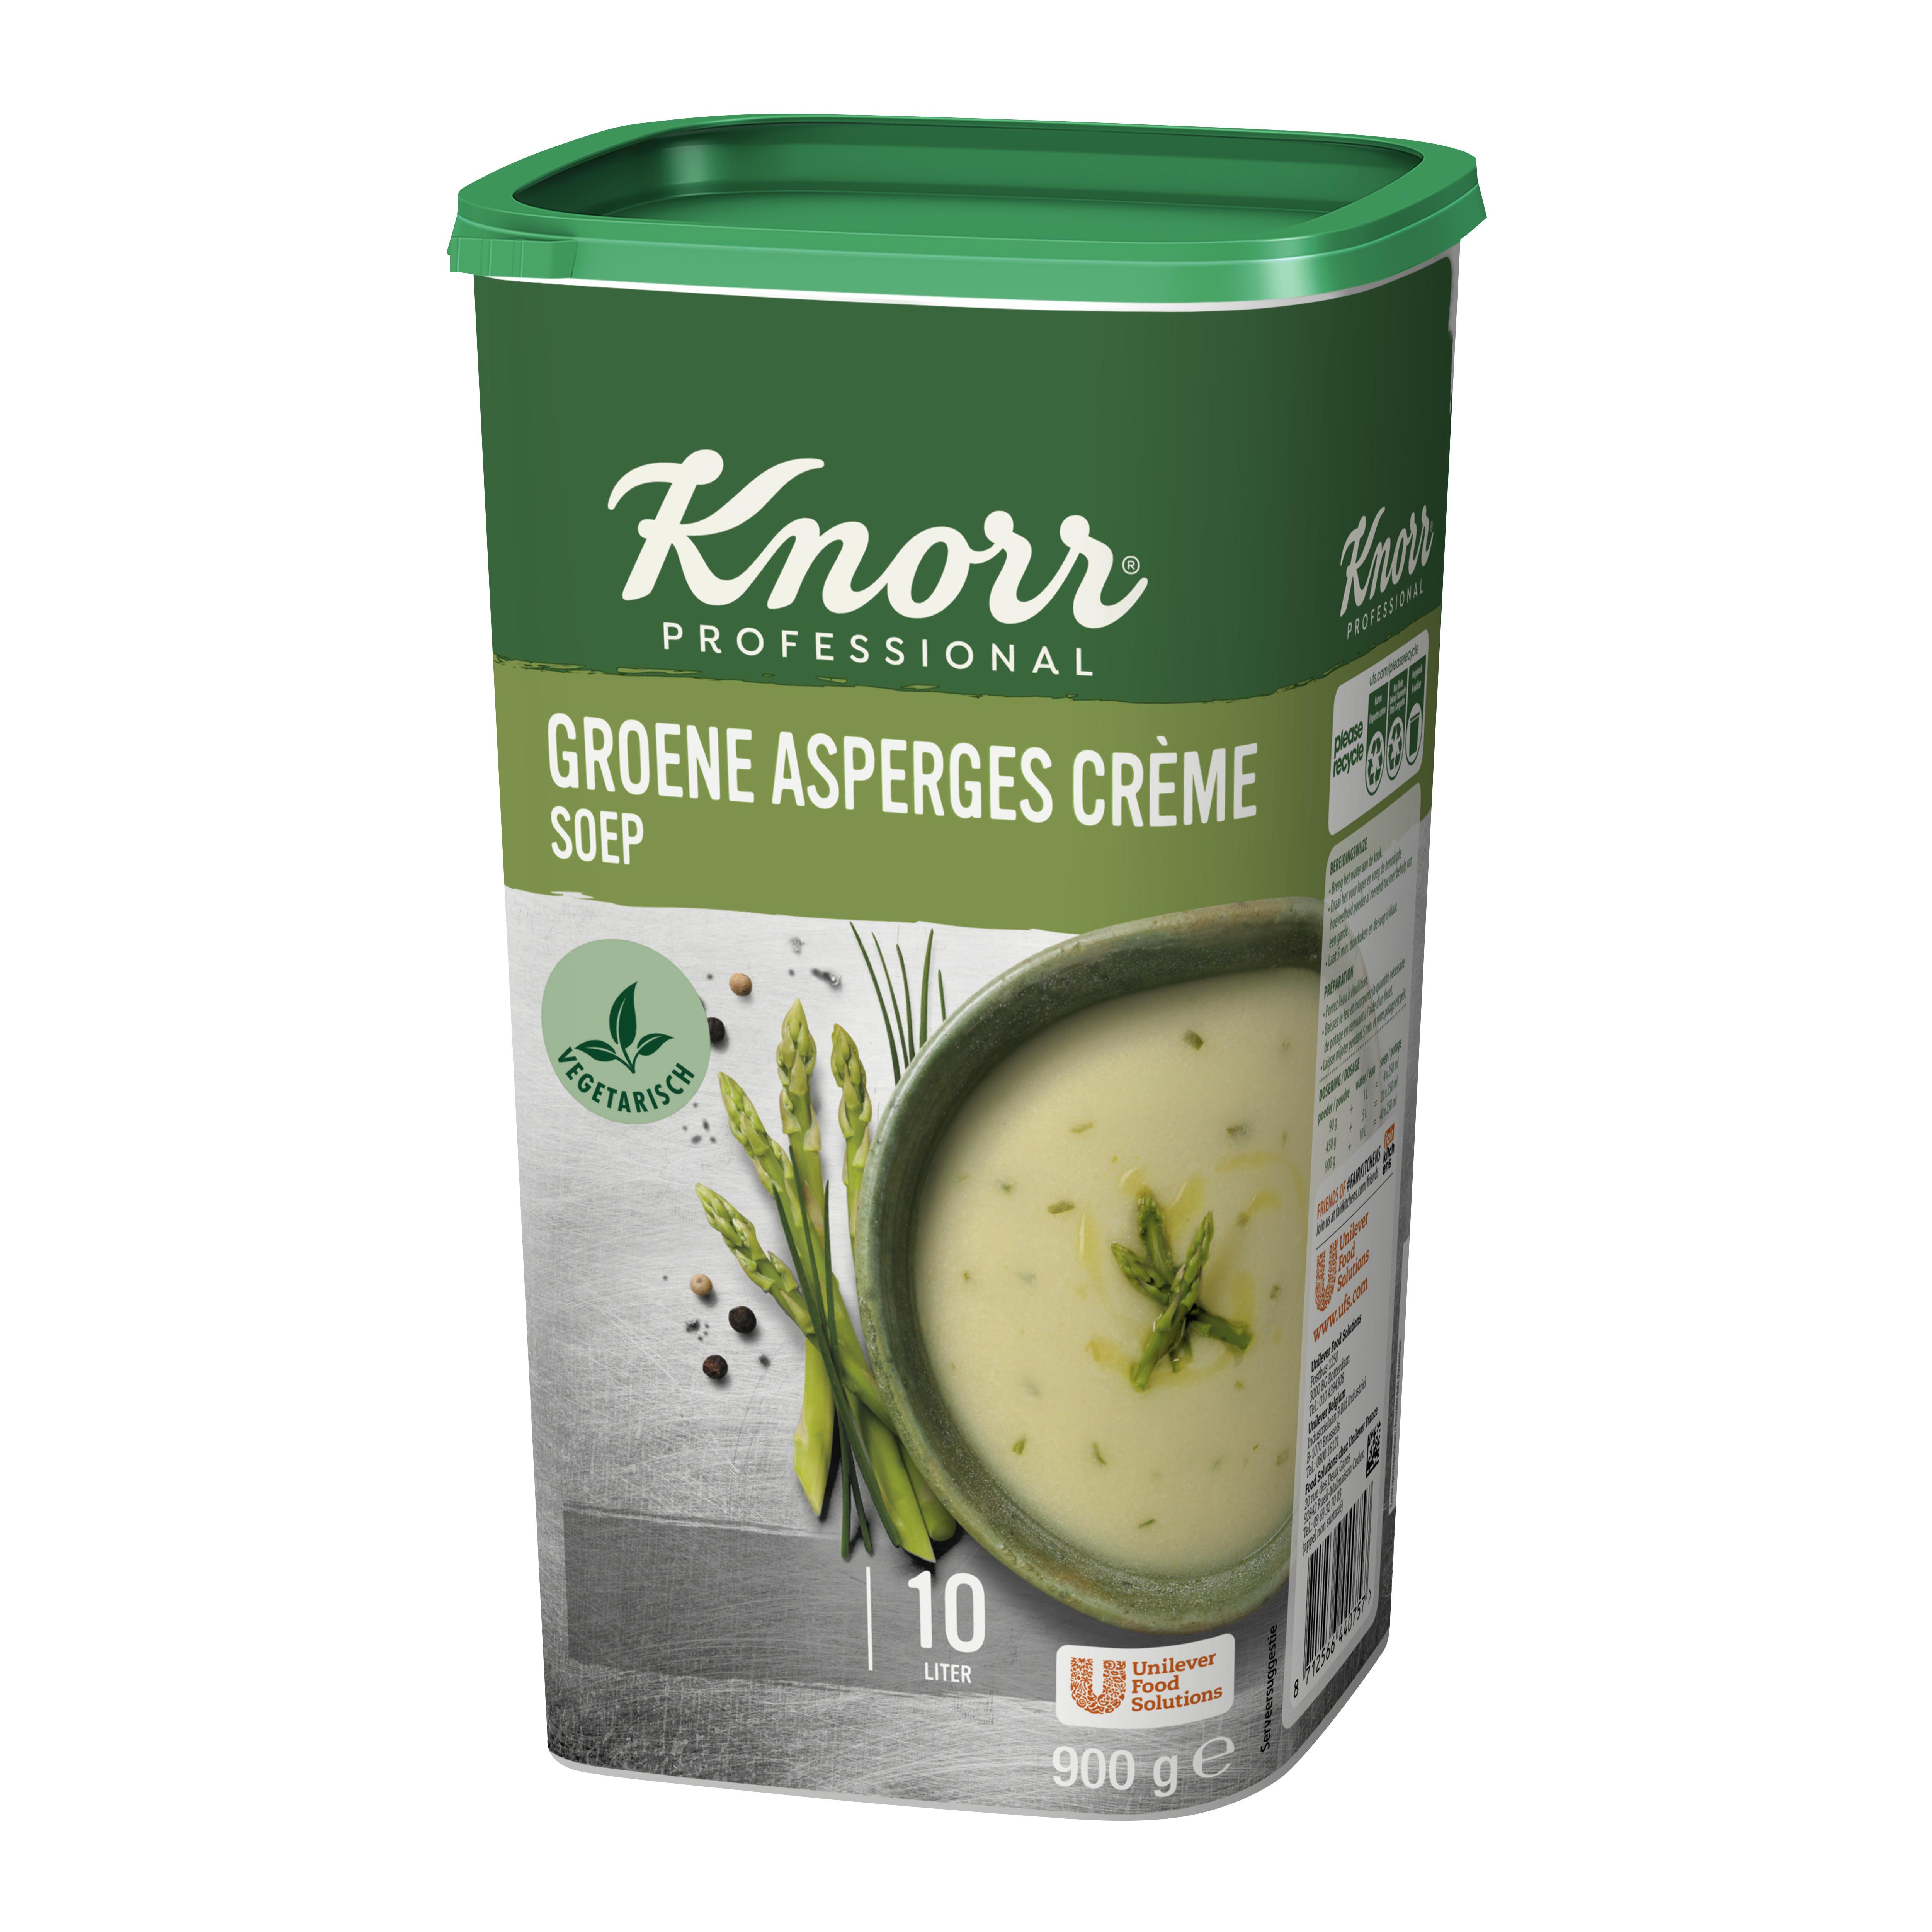 Knorrsoep groene asperges creme soep 0.9kg Professional